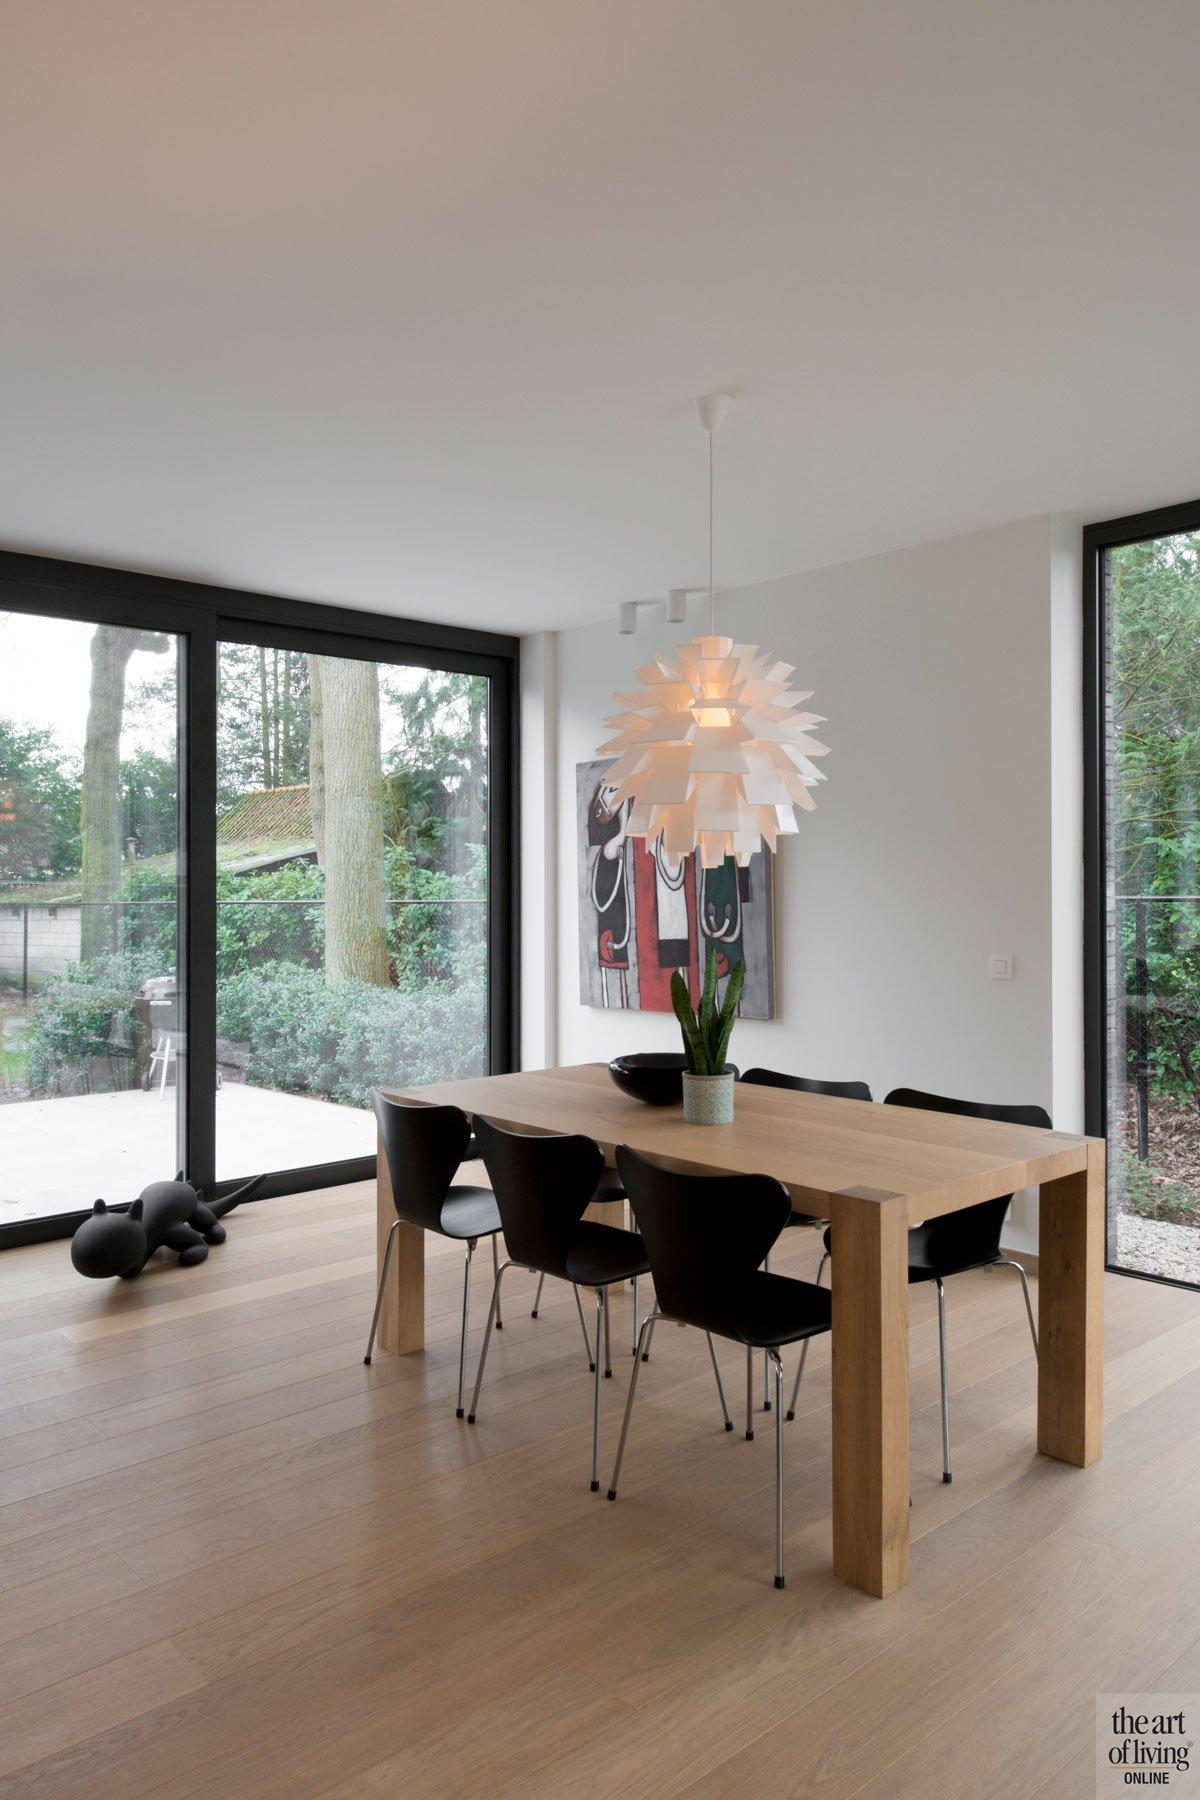 Eetkamer, eettafel, hout, houten vloer, parket, grote ramen, moderne villa, Leers & Partners